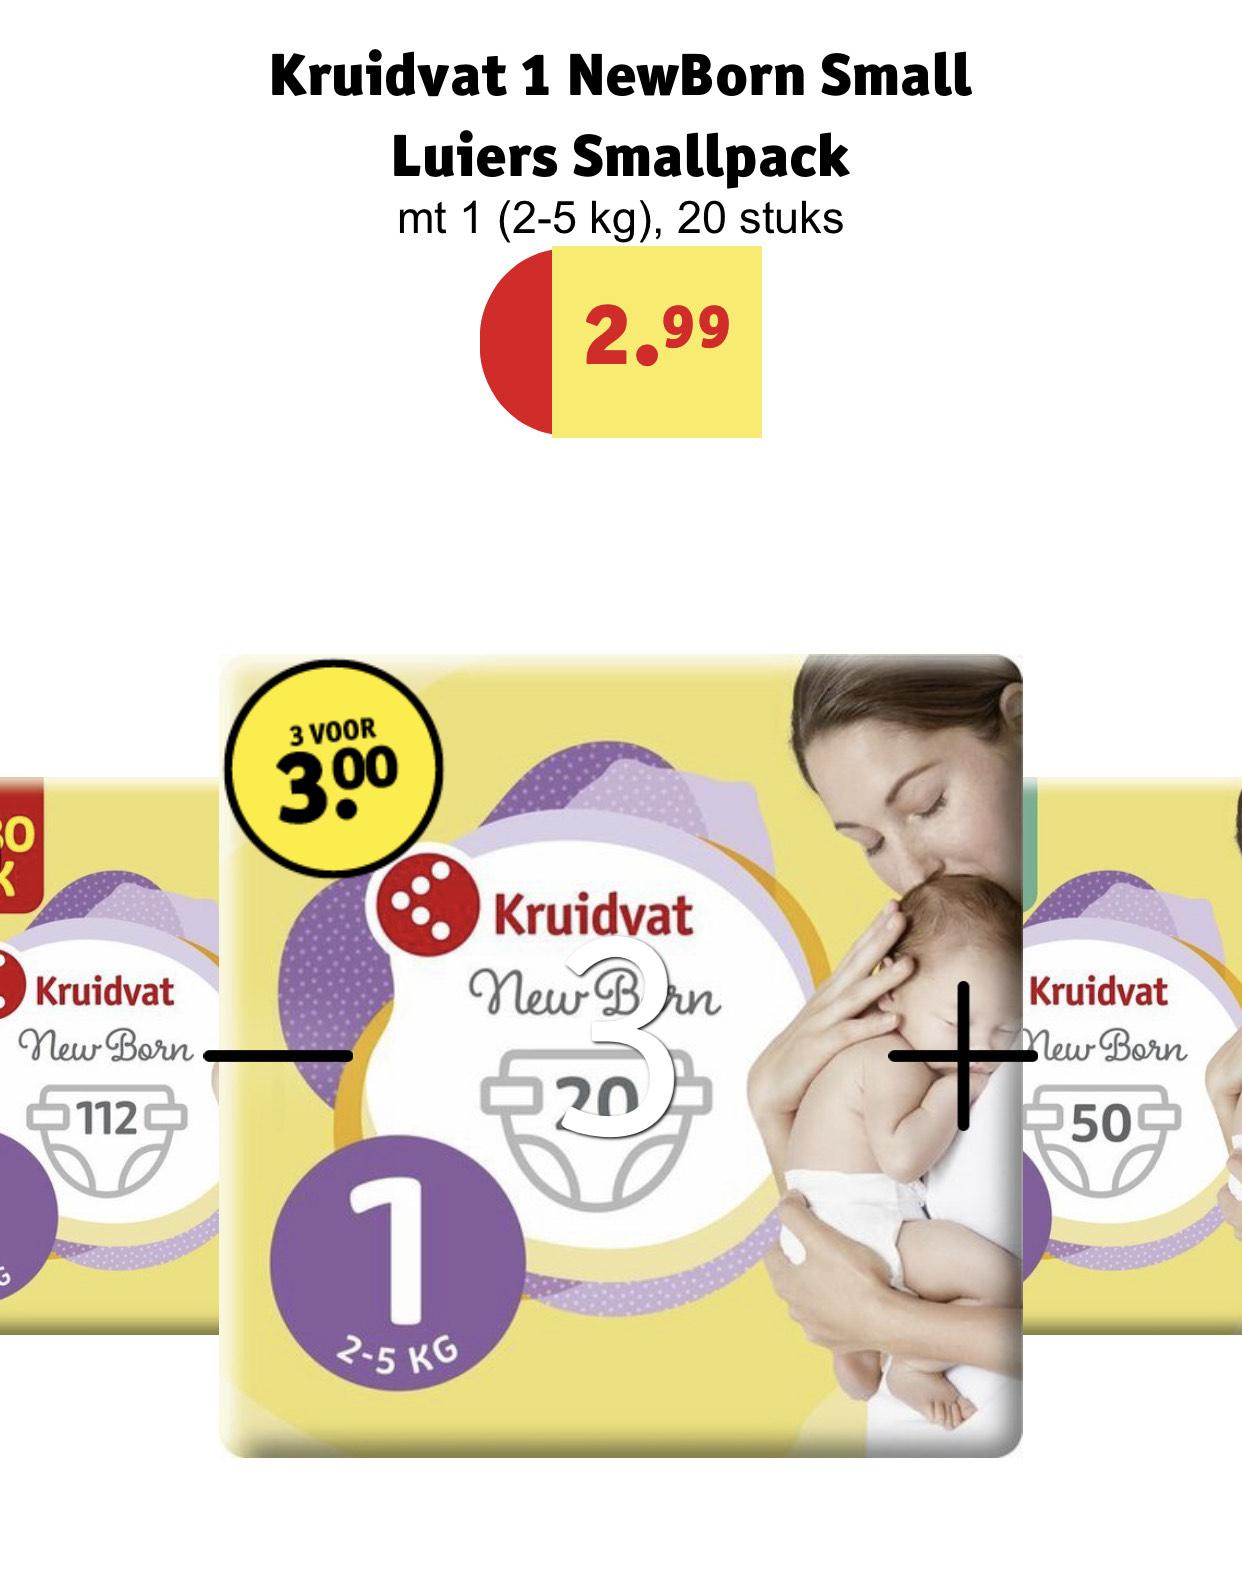 3 pakken Newborn kruidvat luiers voor €3,-